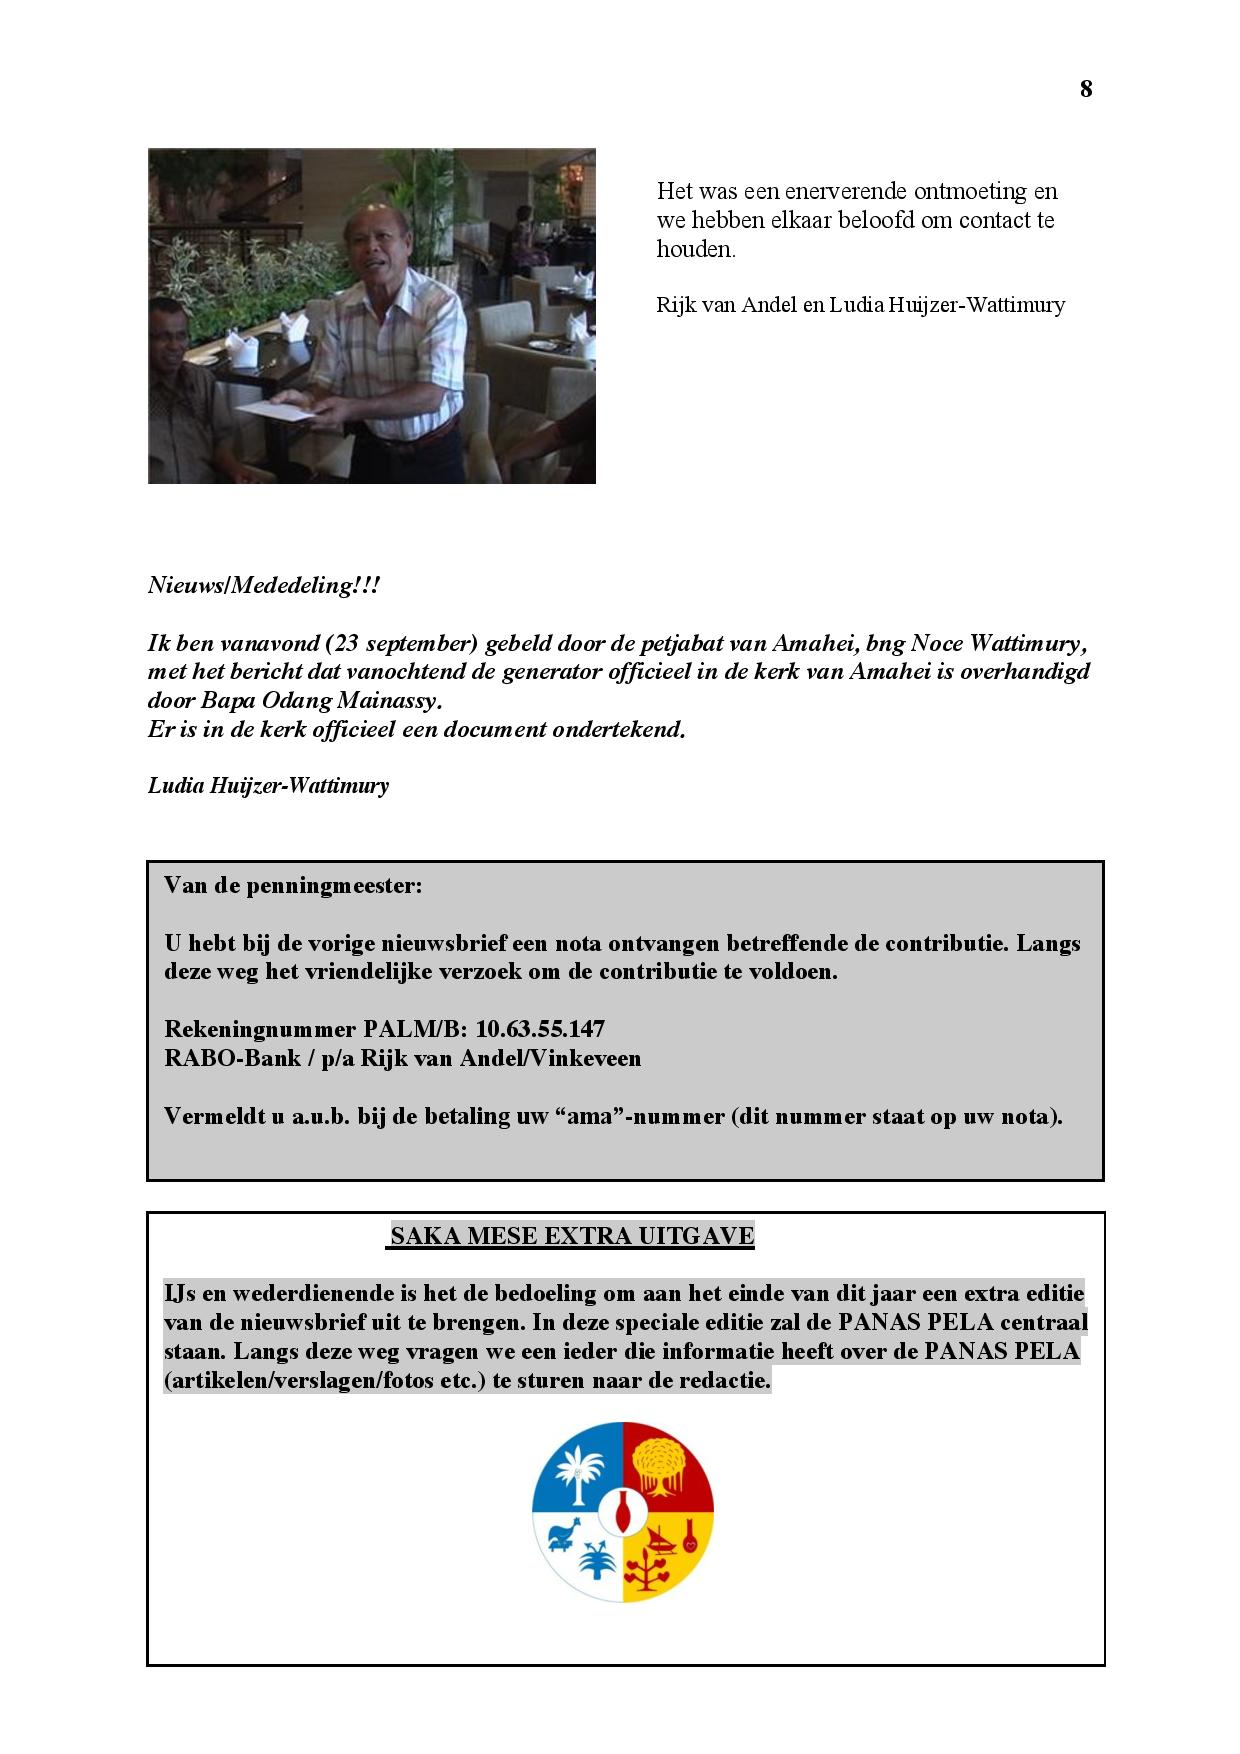 Saka Mese 3e jaargang nr. 02-2007 definitieve webversie-page-008